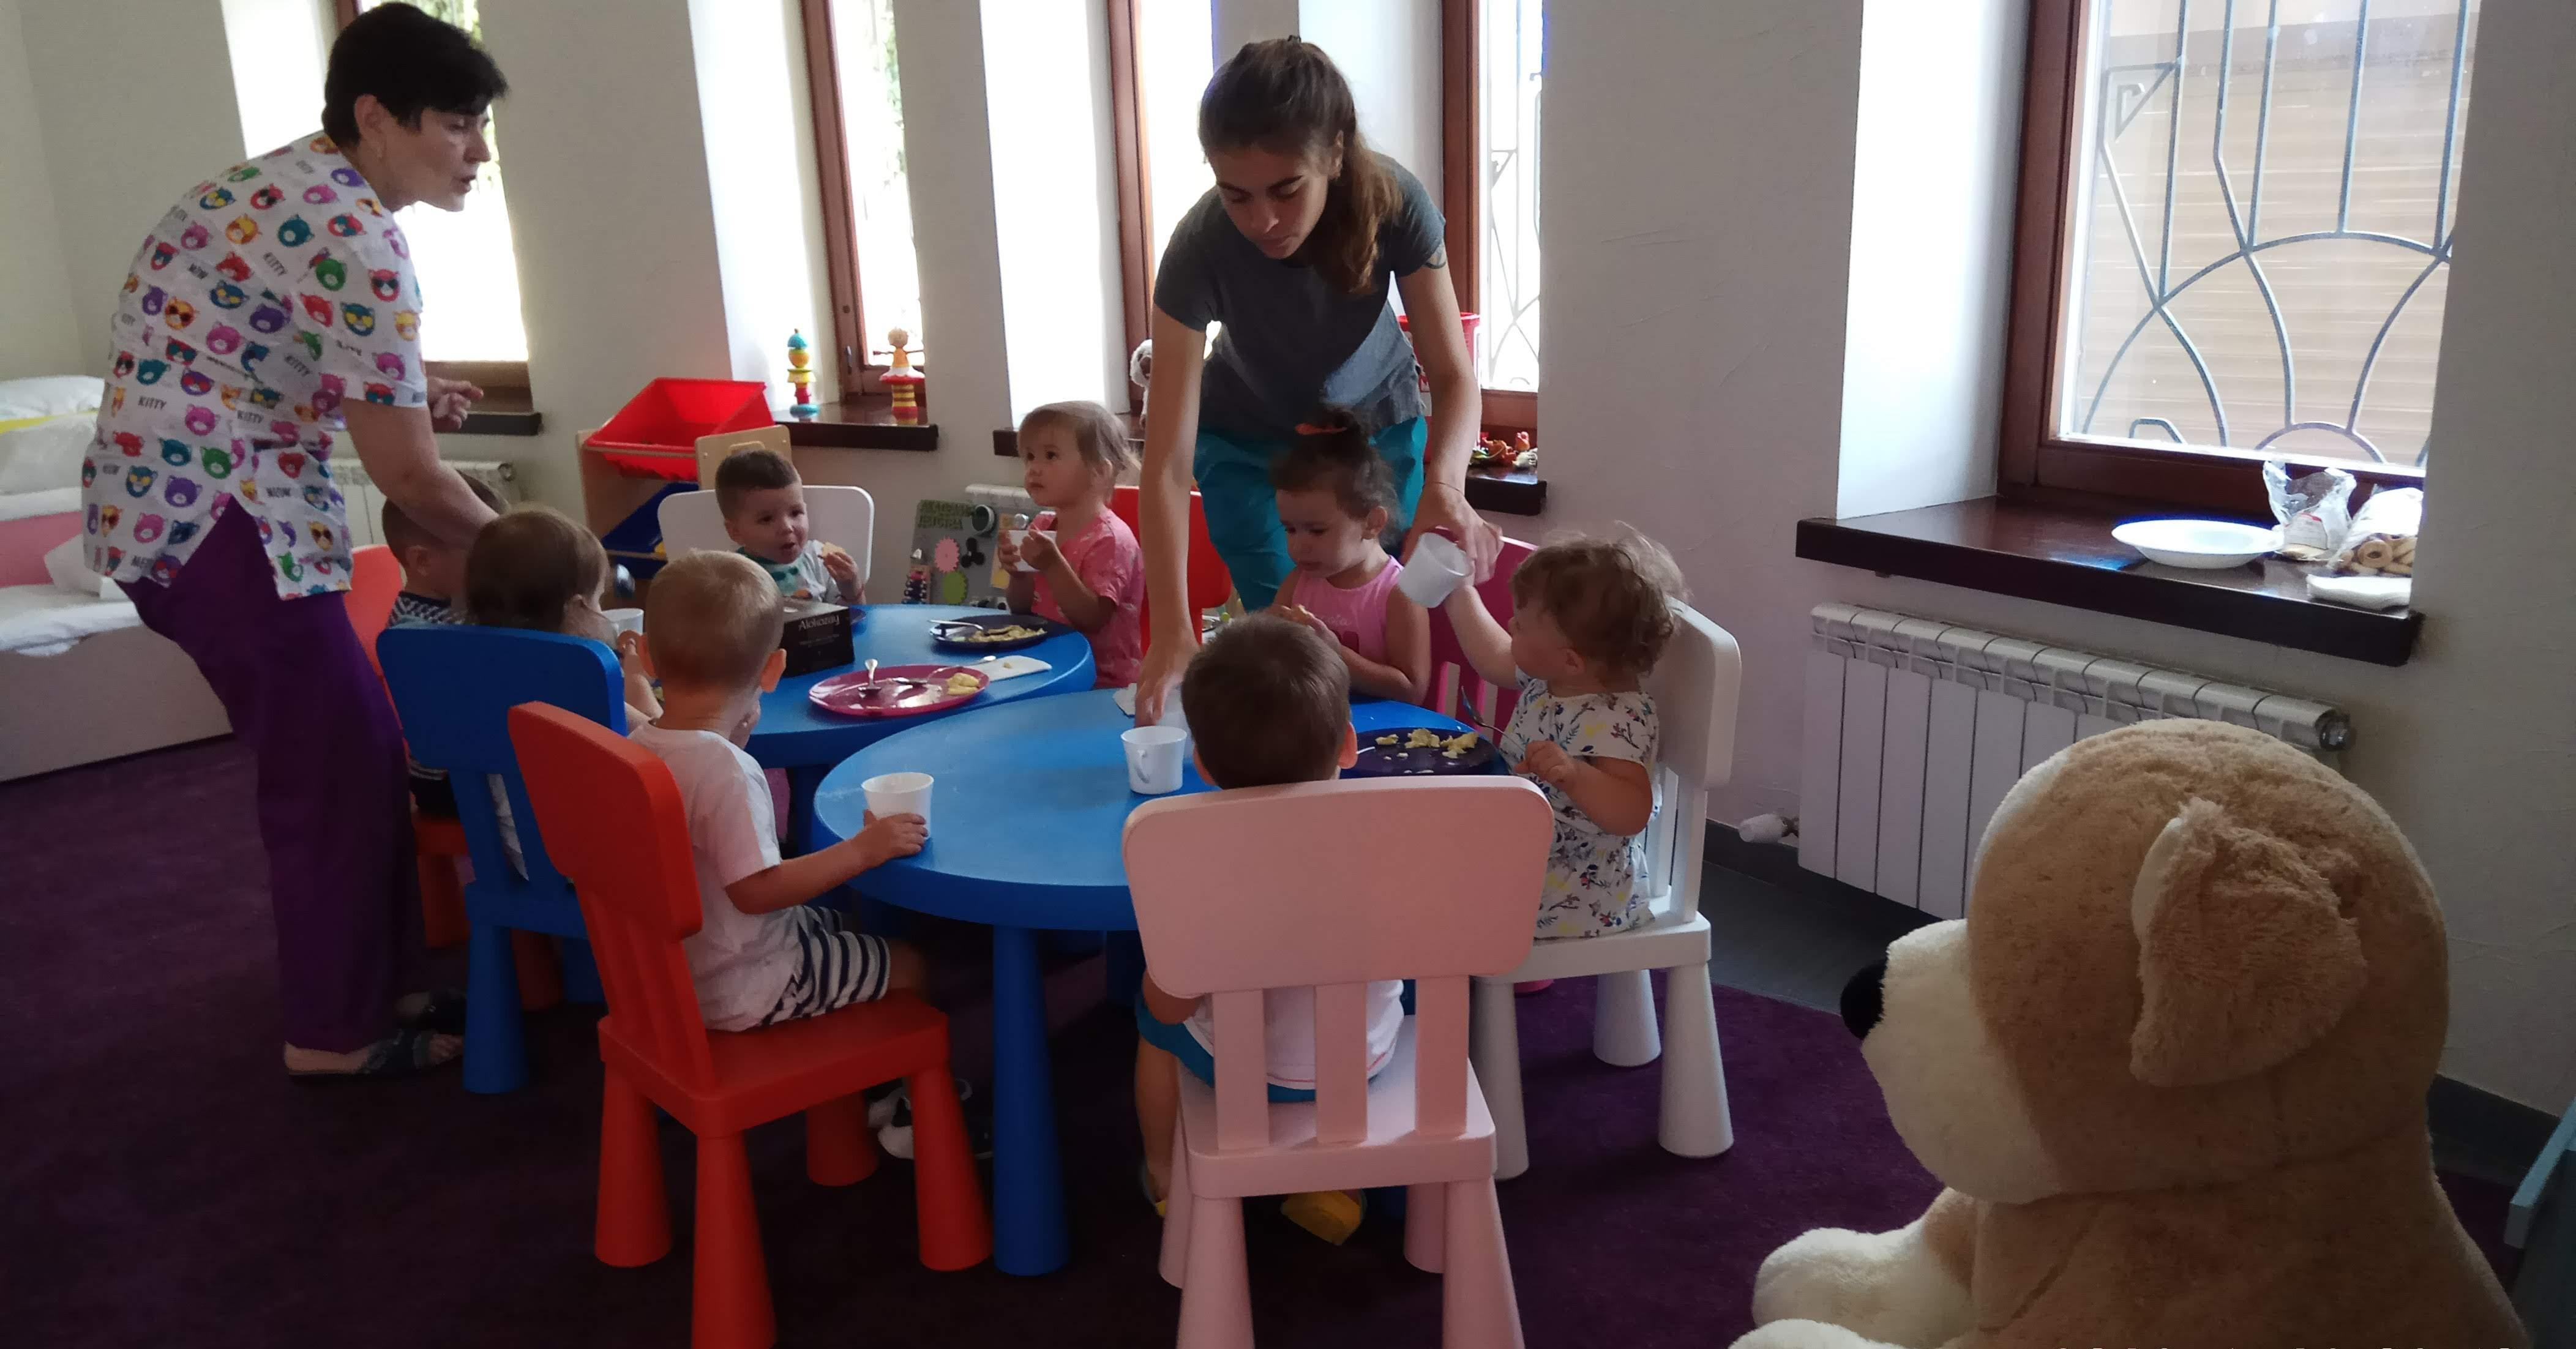 https://akademia-detstva.od.ua/app/uploads/2019/08/IMG_20190618_094032.jpg